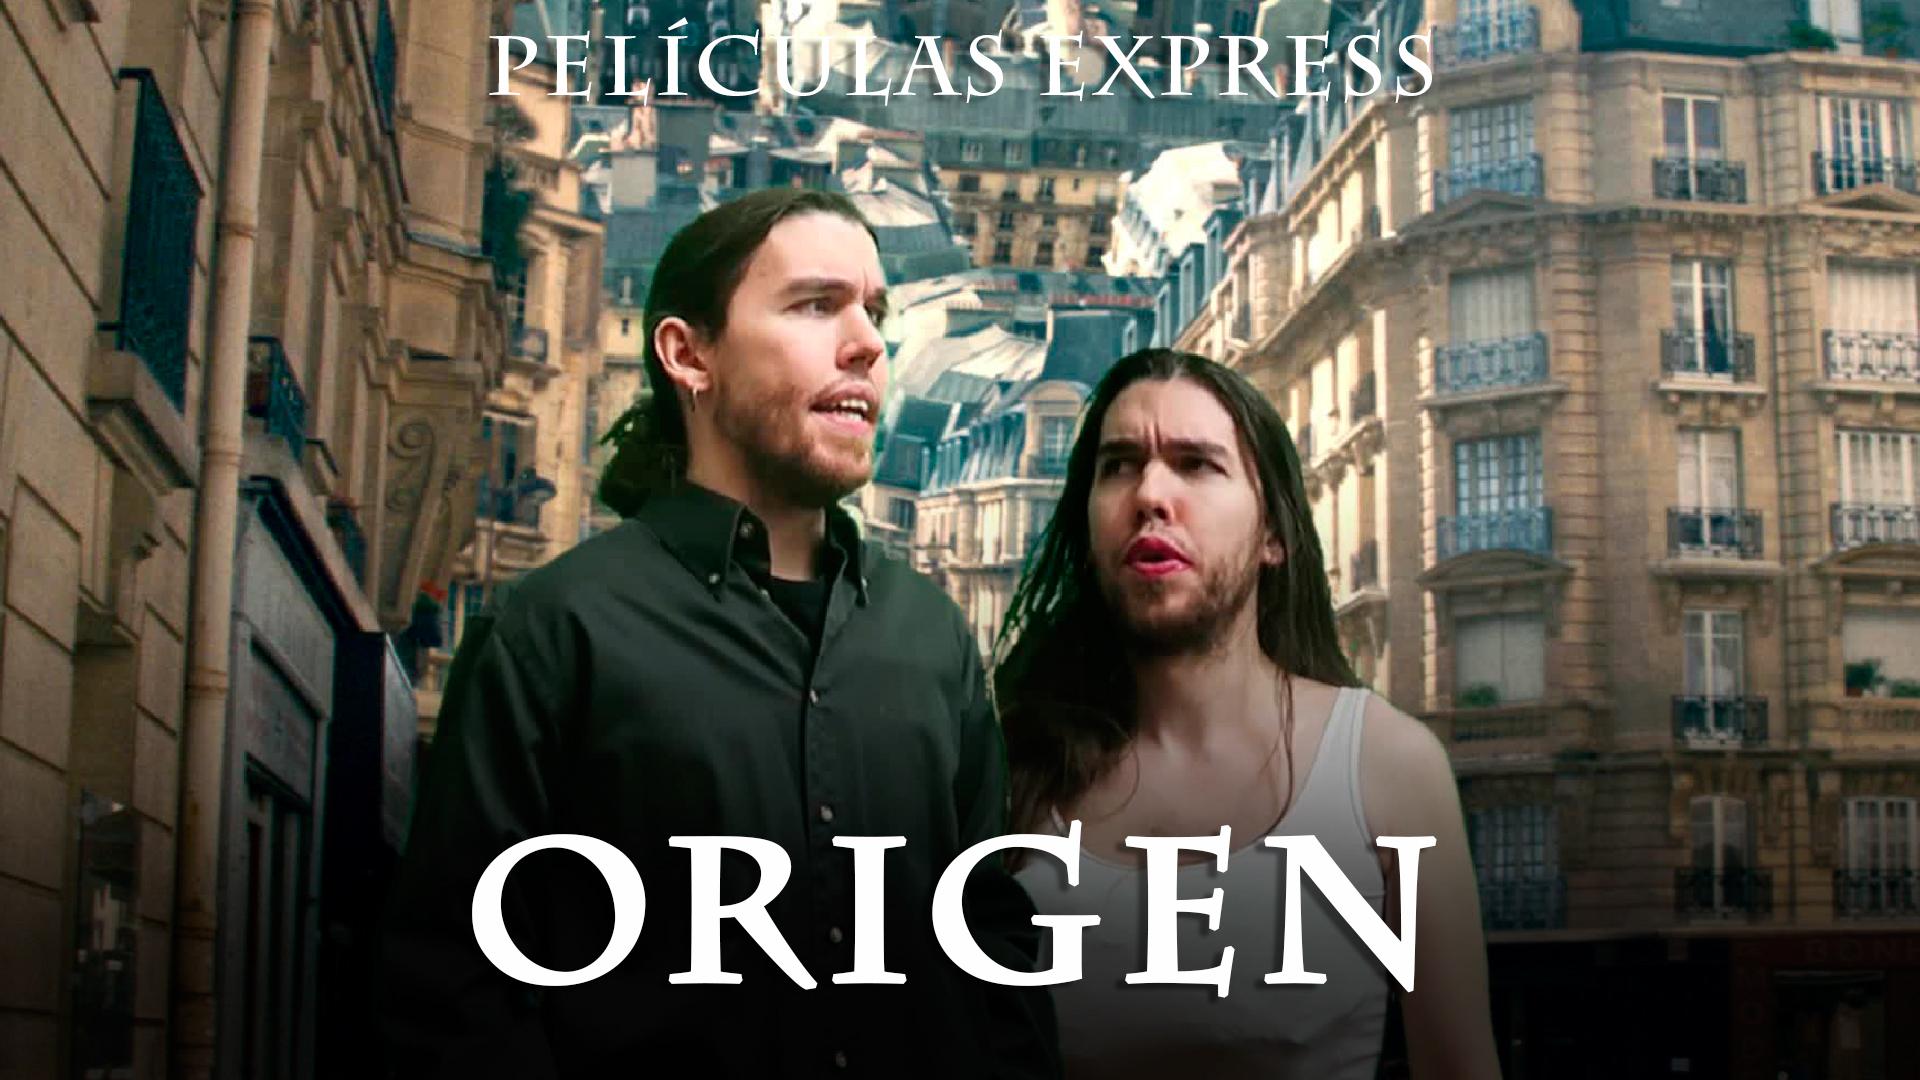 Temporada 1 Origen en 30 segundos